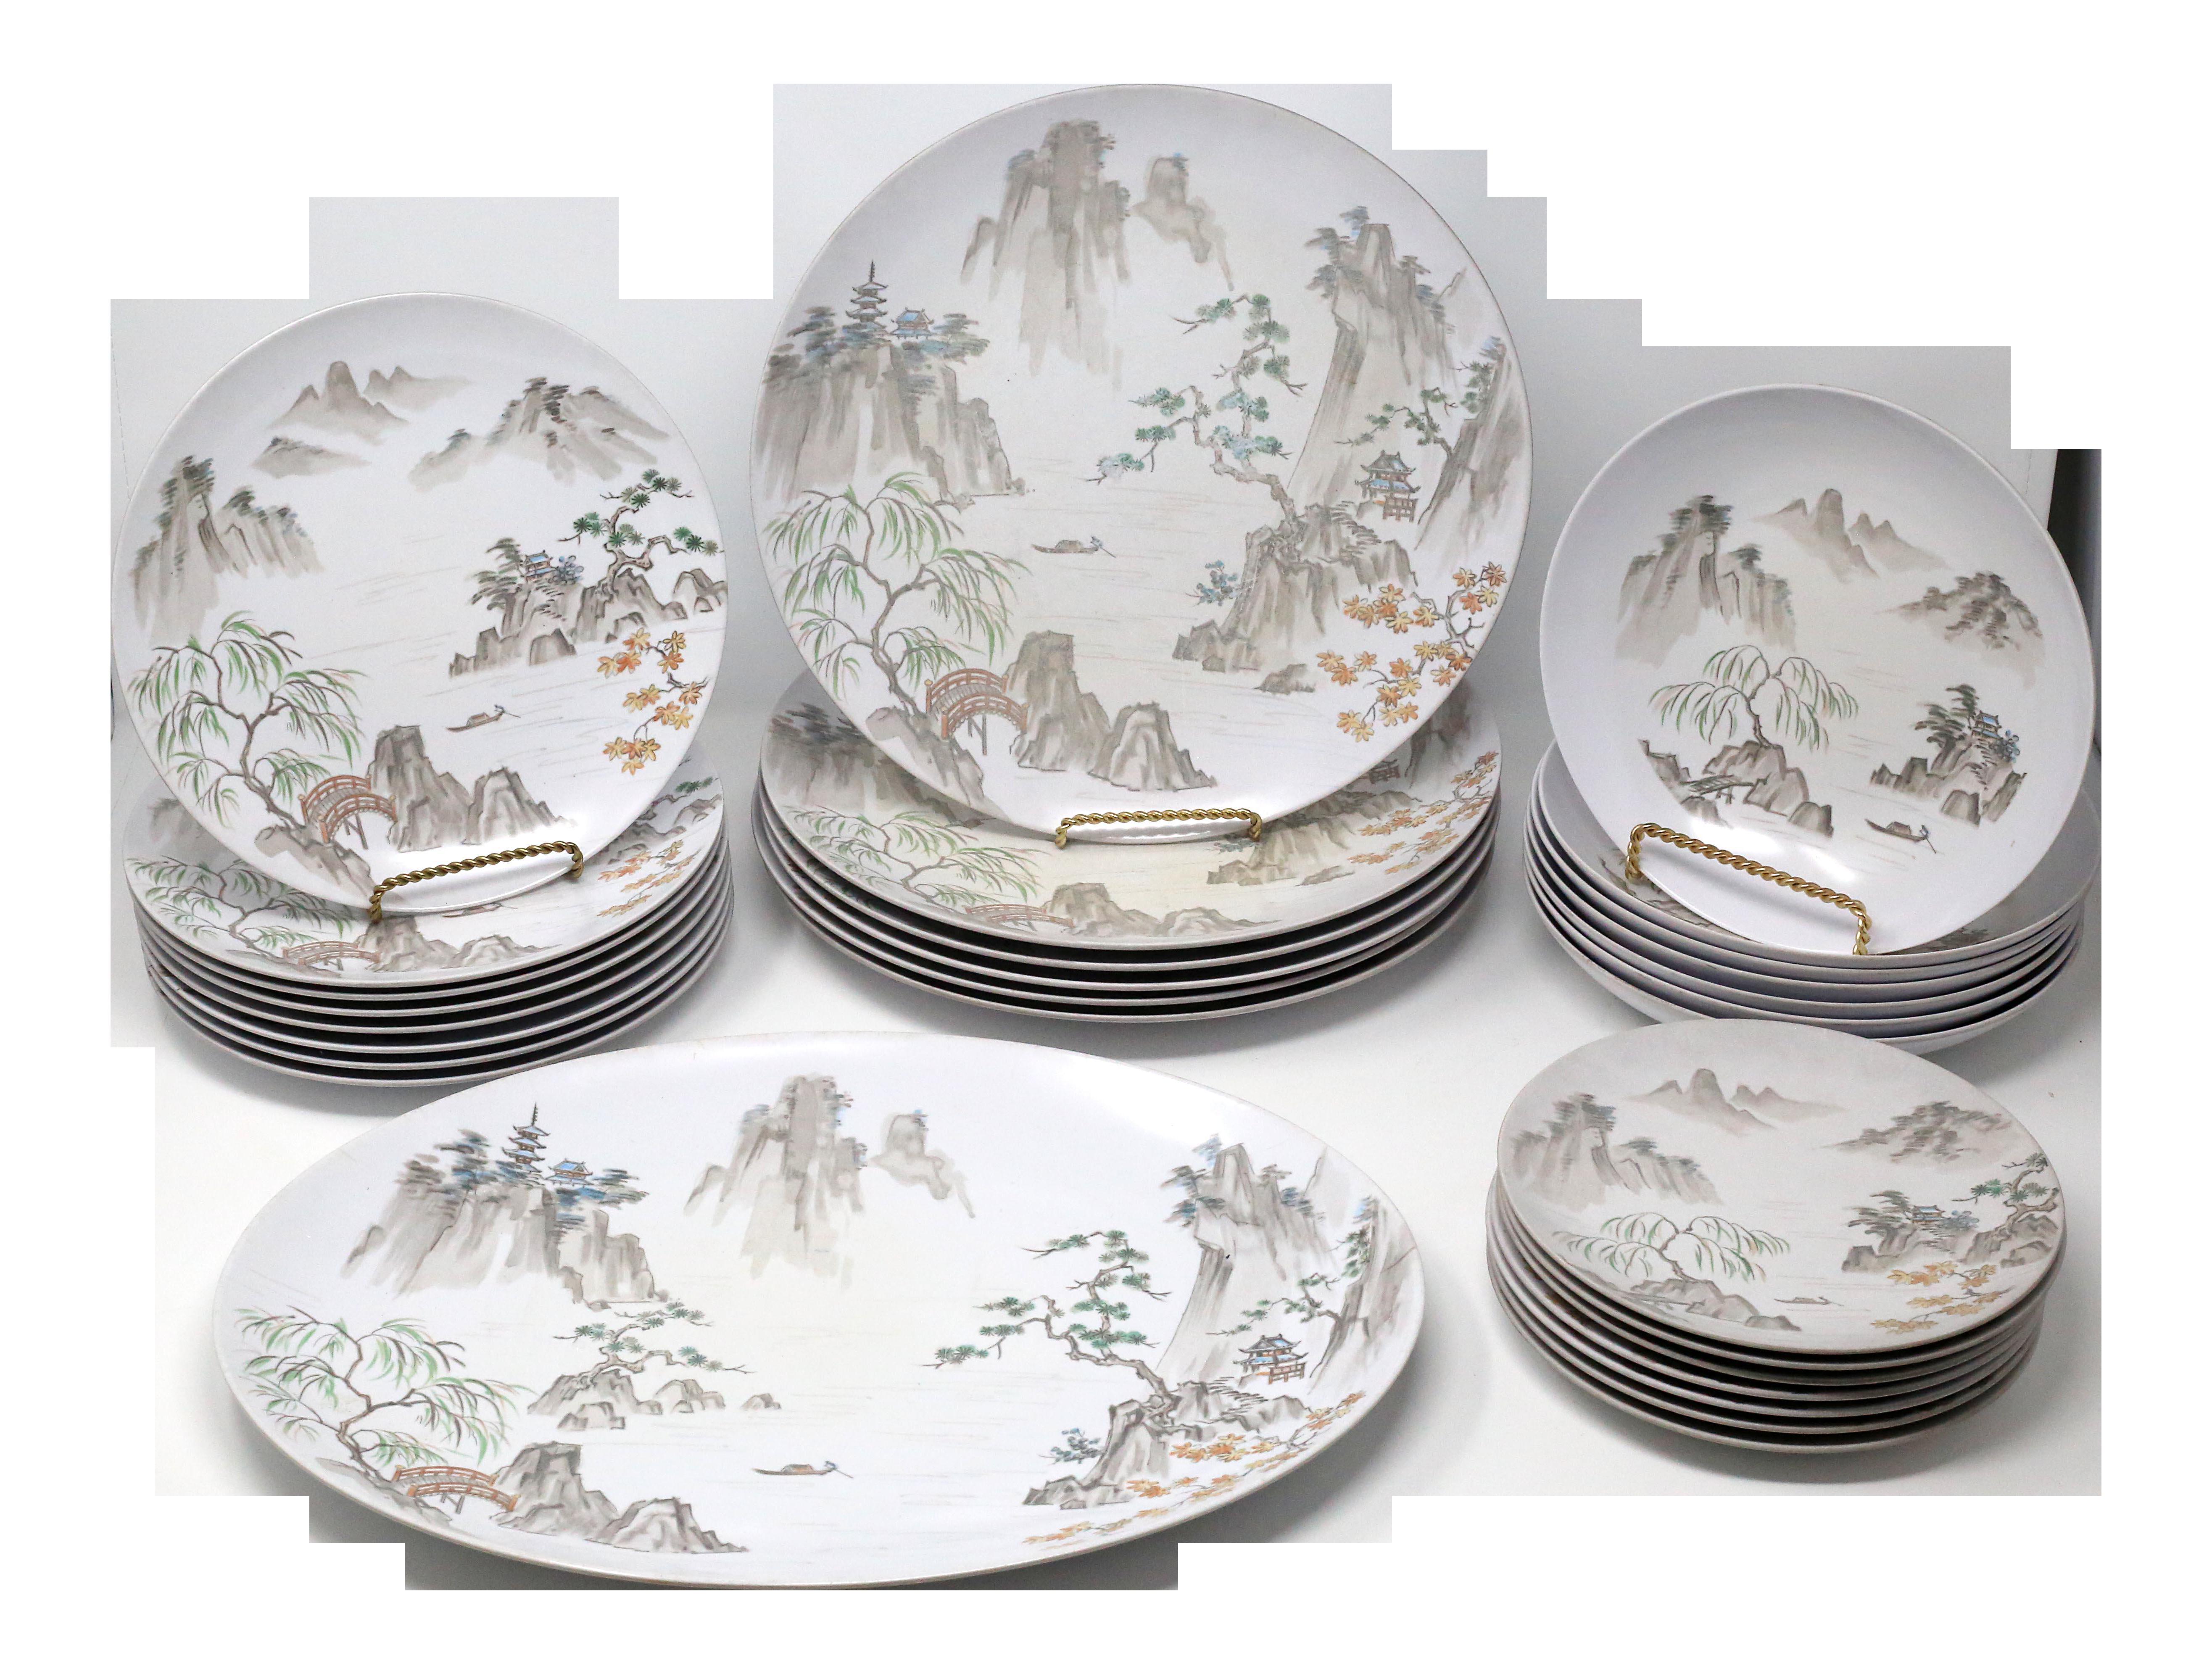 Vintage Noritake Japan Melamine Dinnerware Set Of 29 On Chairish Com In 2020 Melamine Dinnerware Sets Melamine Dinnerware Dinnerware